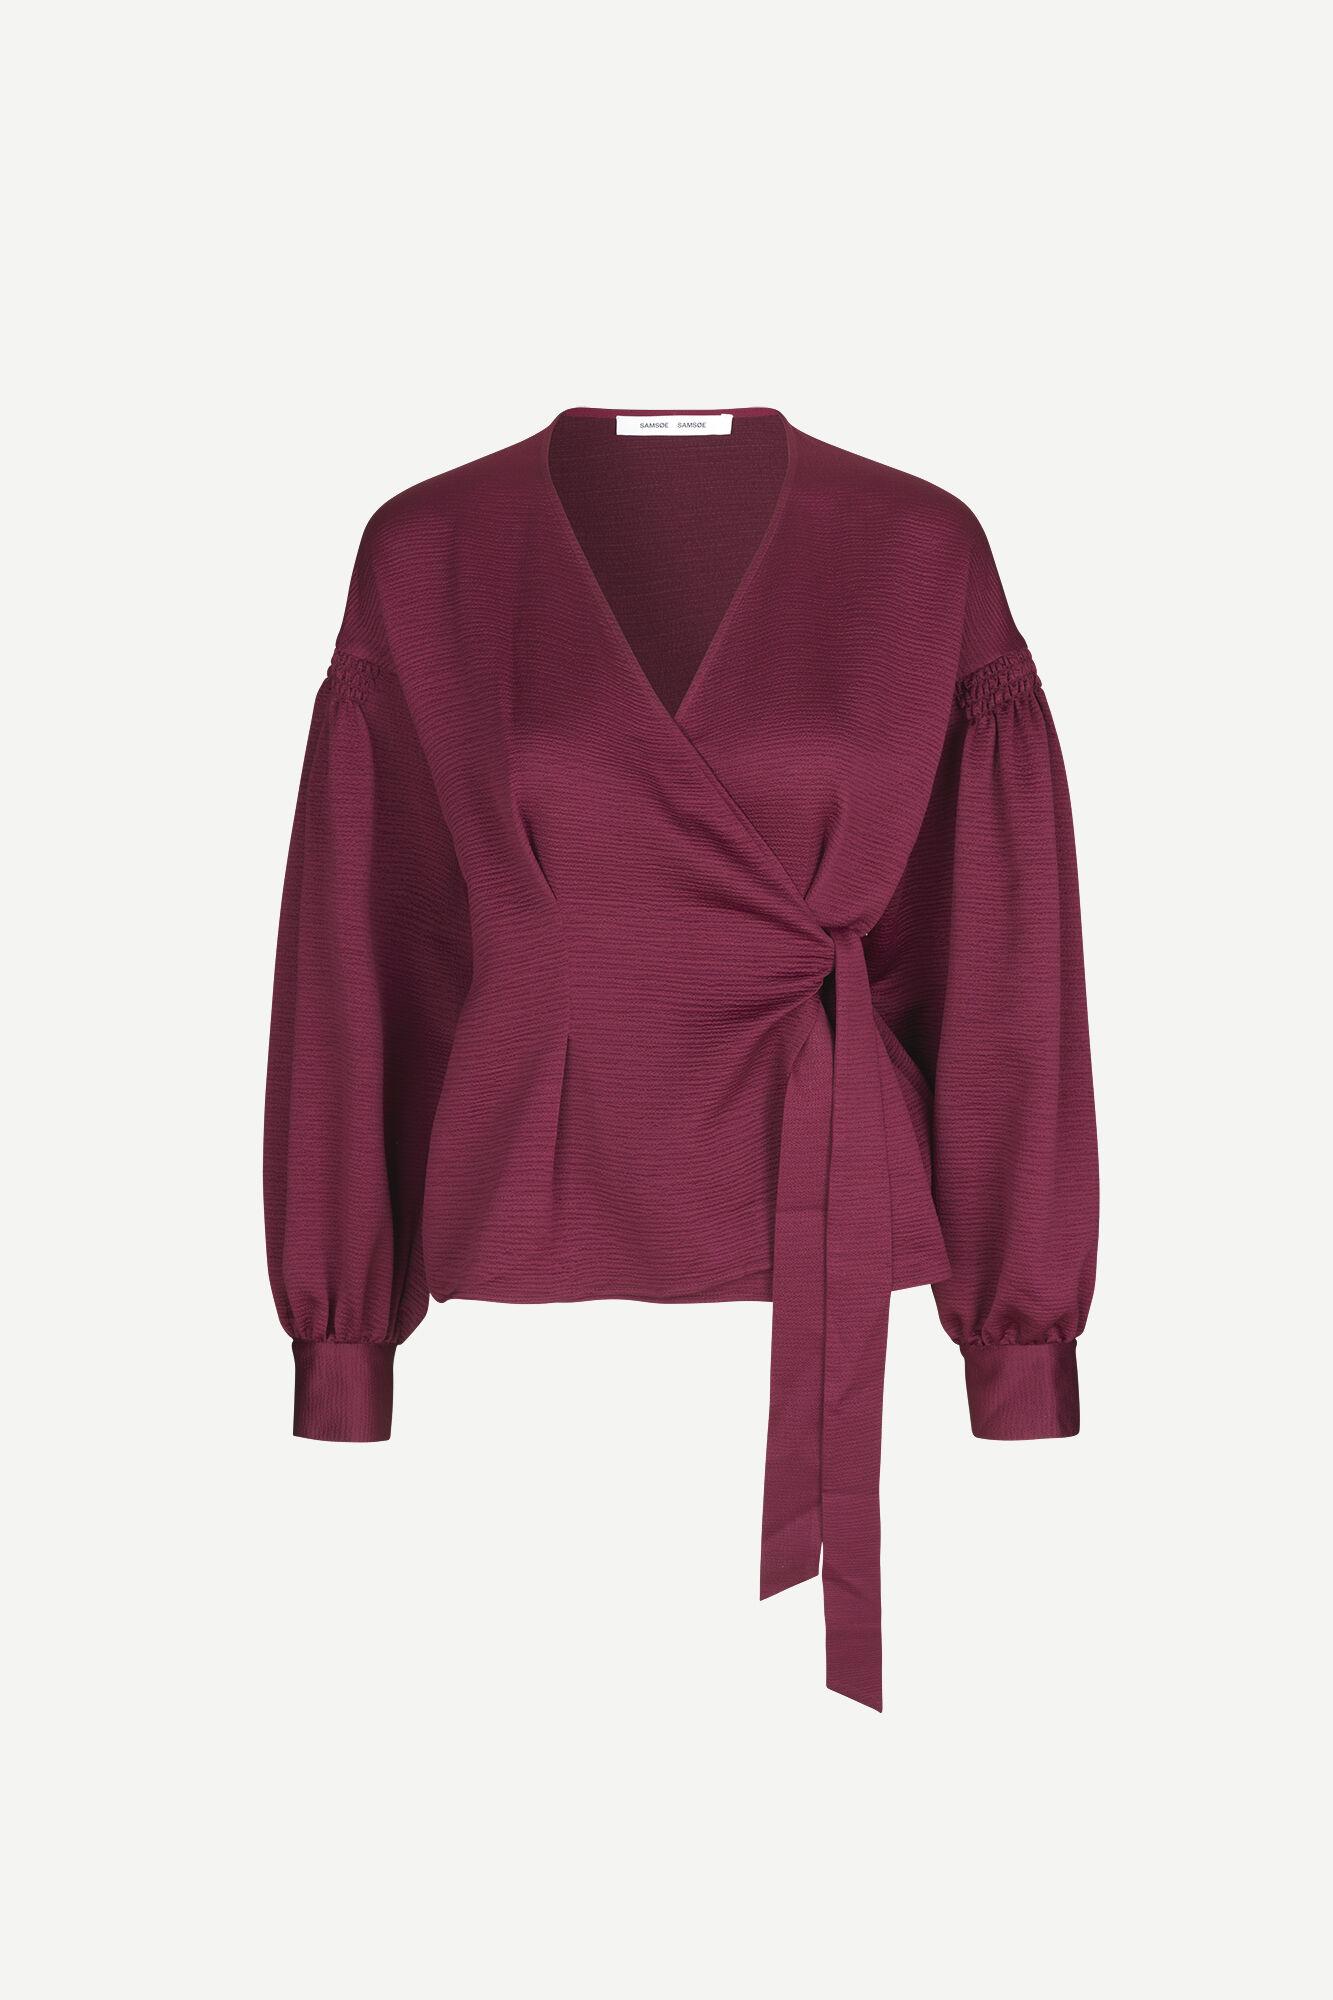 Merrill blouse 11242